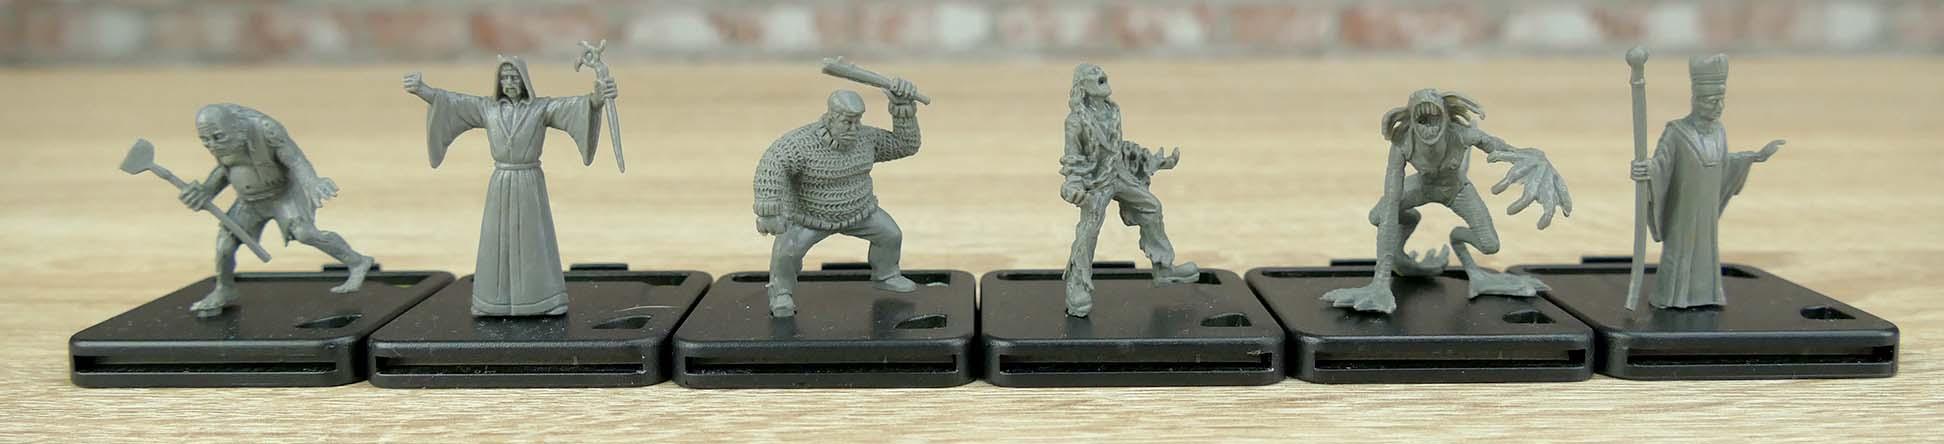 Villen des Wahnsinns 2 kleine Miniaturen